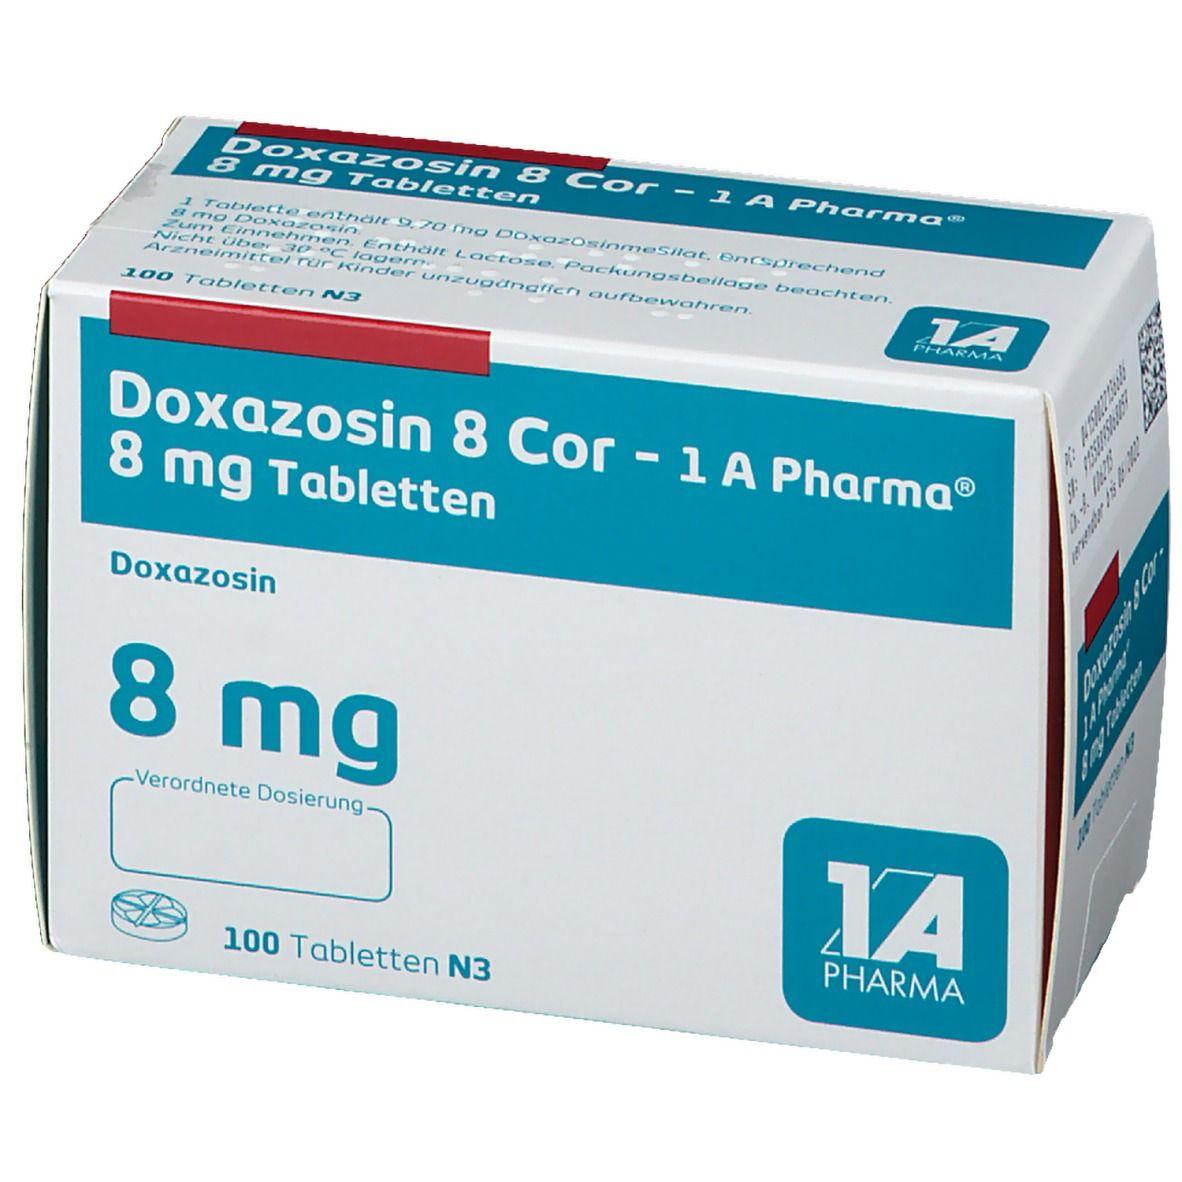 DOXAZOSIN 8 Cor 1A Pharma Tabletten